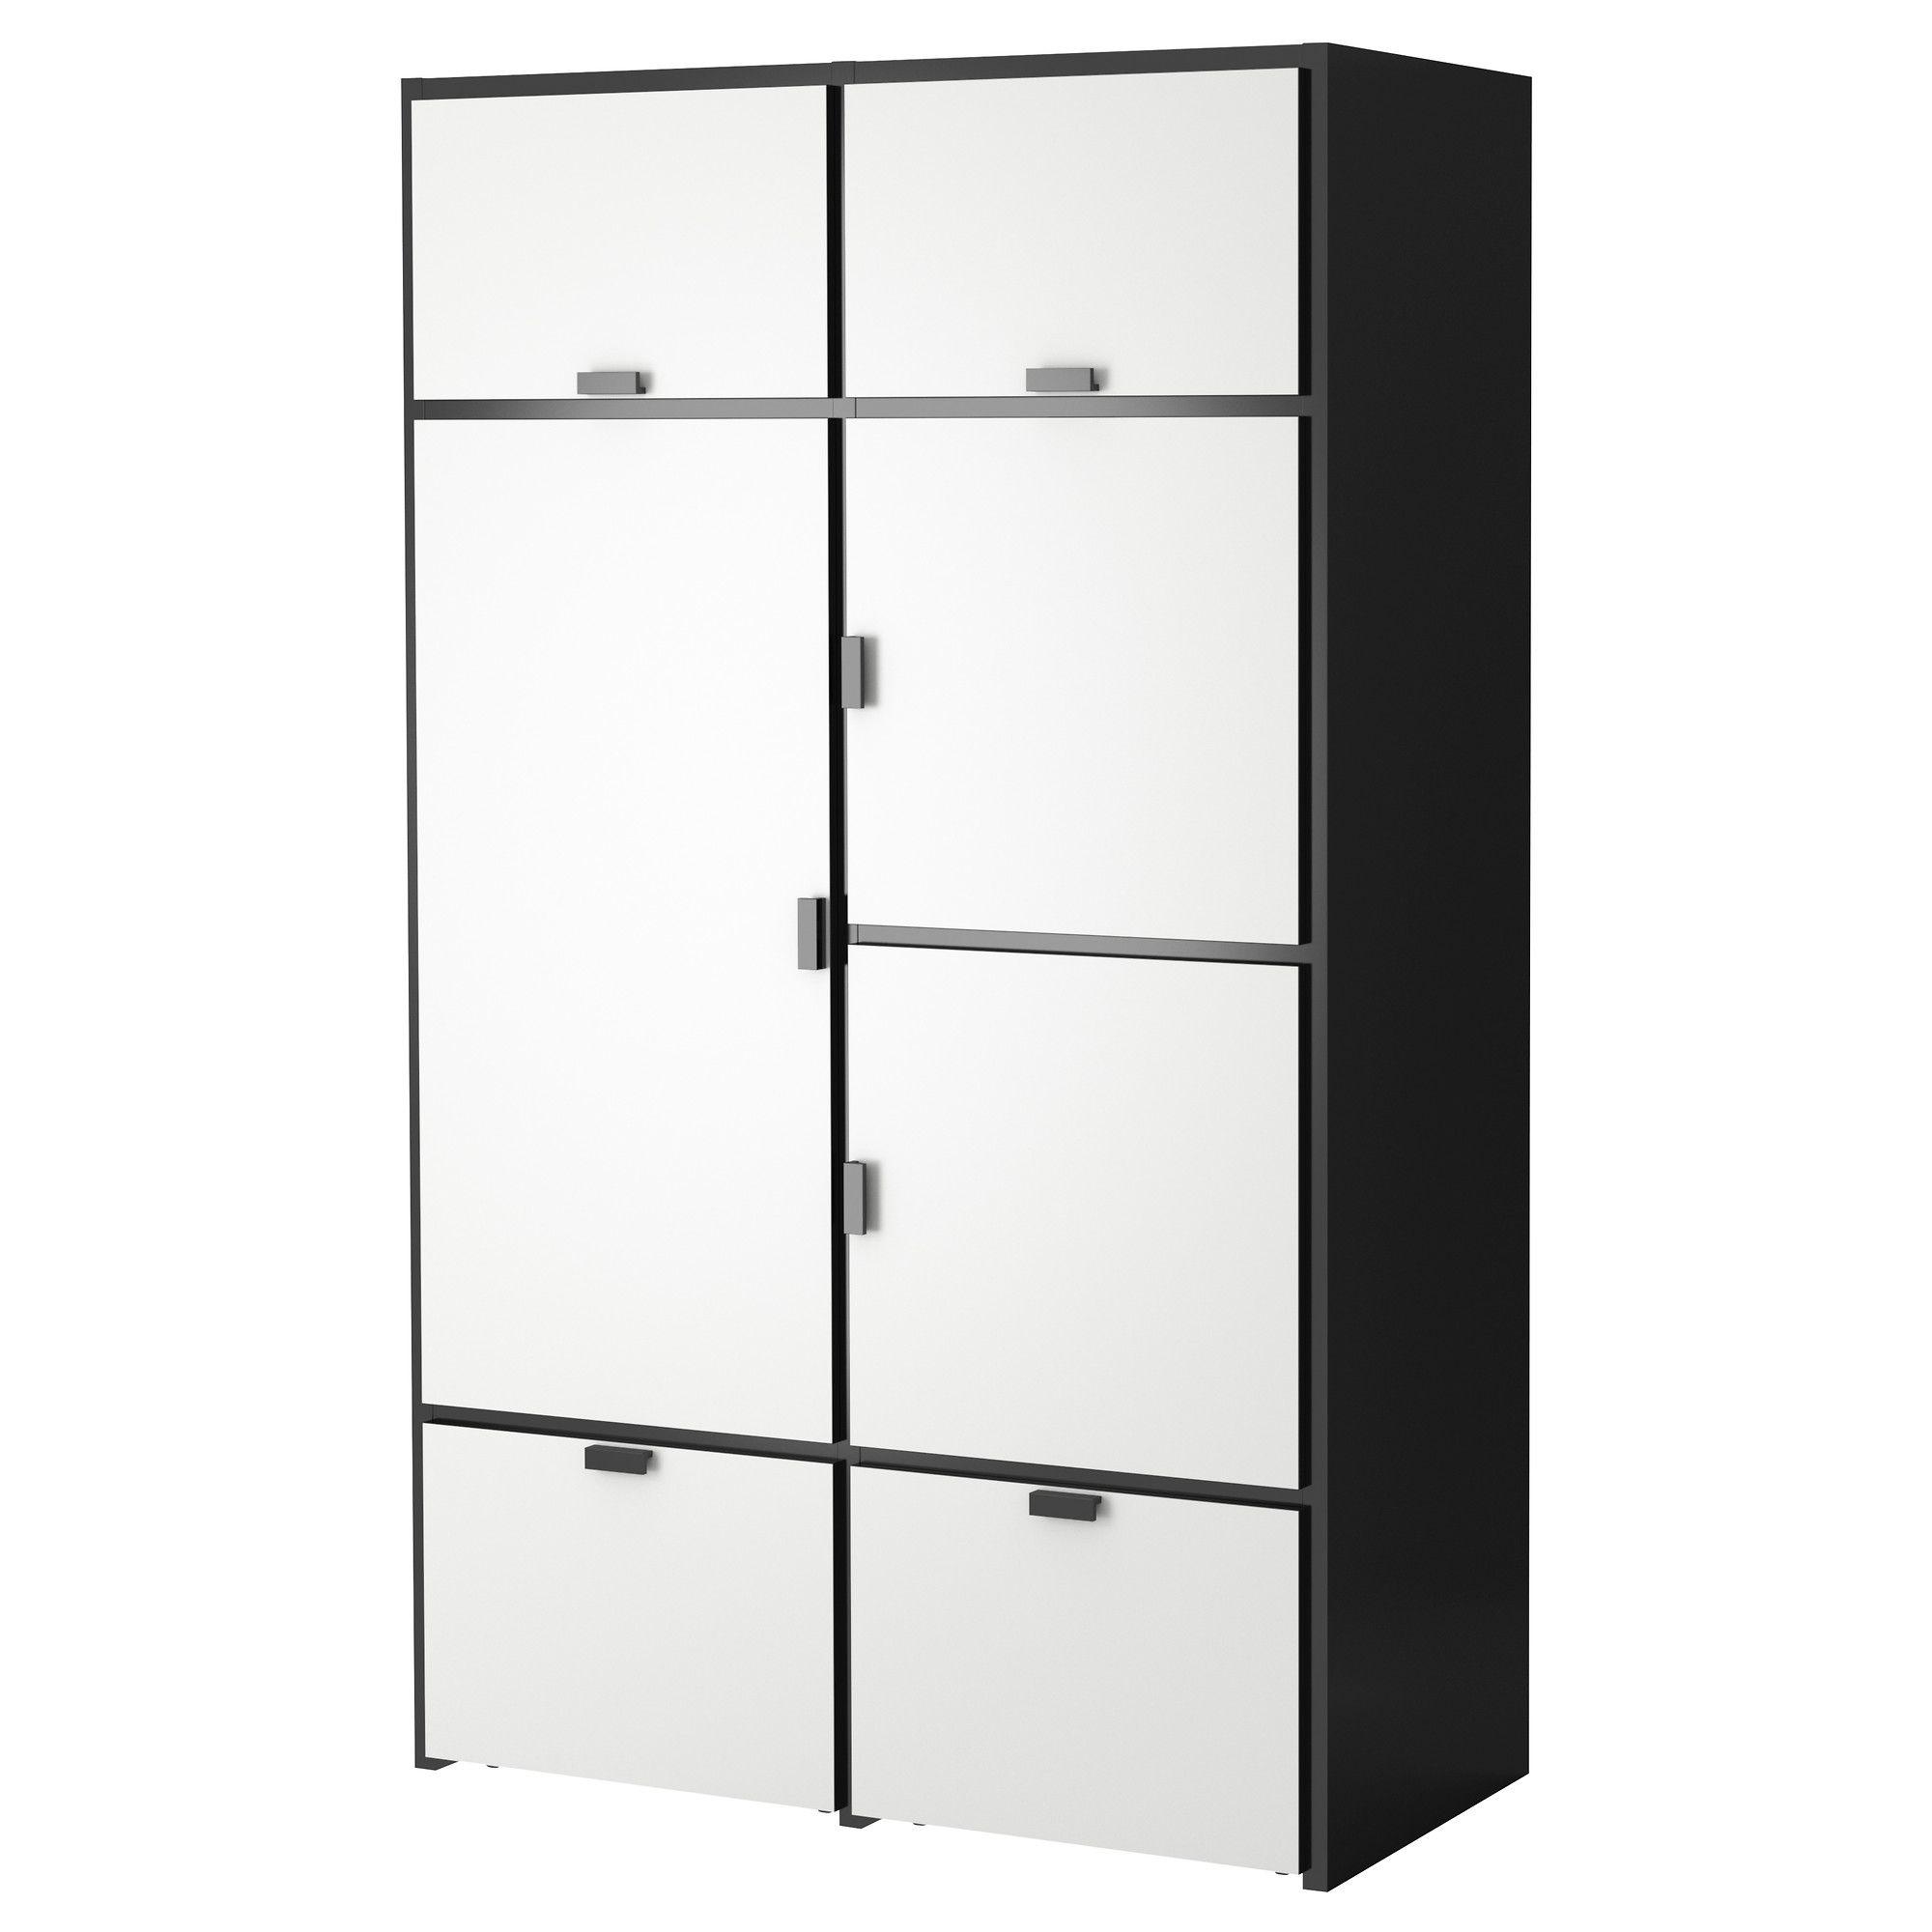 ikea jugendschrank luxus 30 von ikea schrank selbst gestalten hauptideen. Black Bedroom Furniture Sets. Home Design Ideas